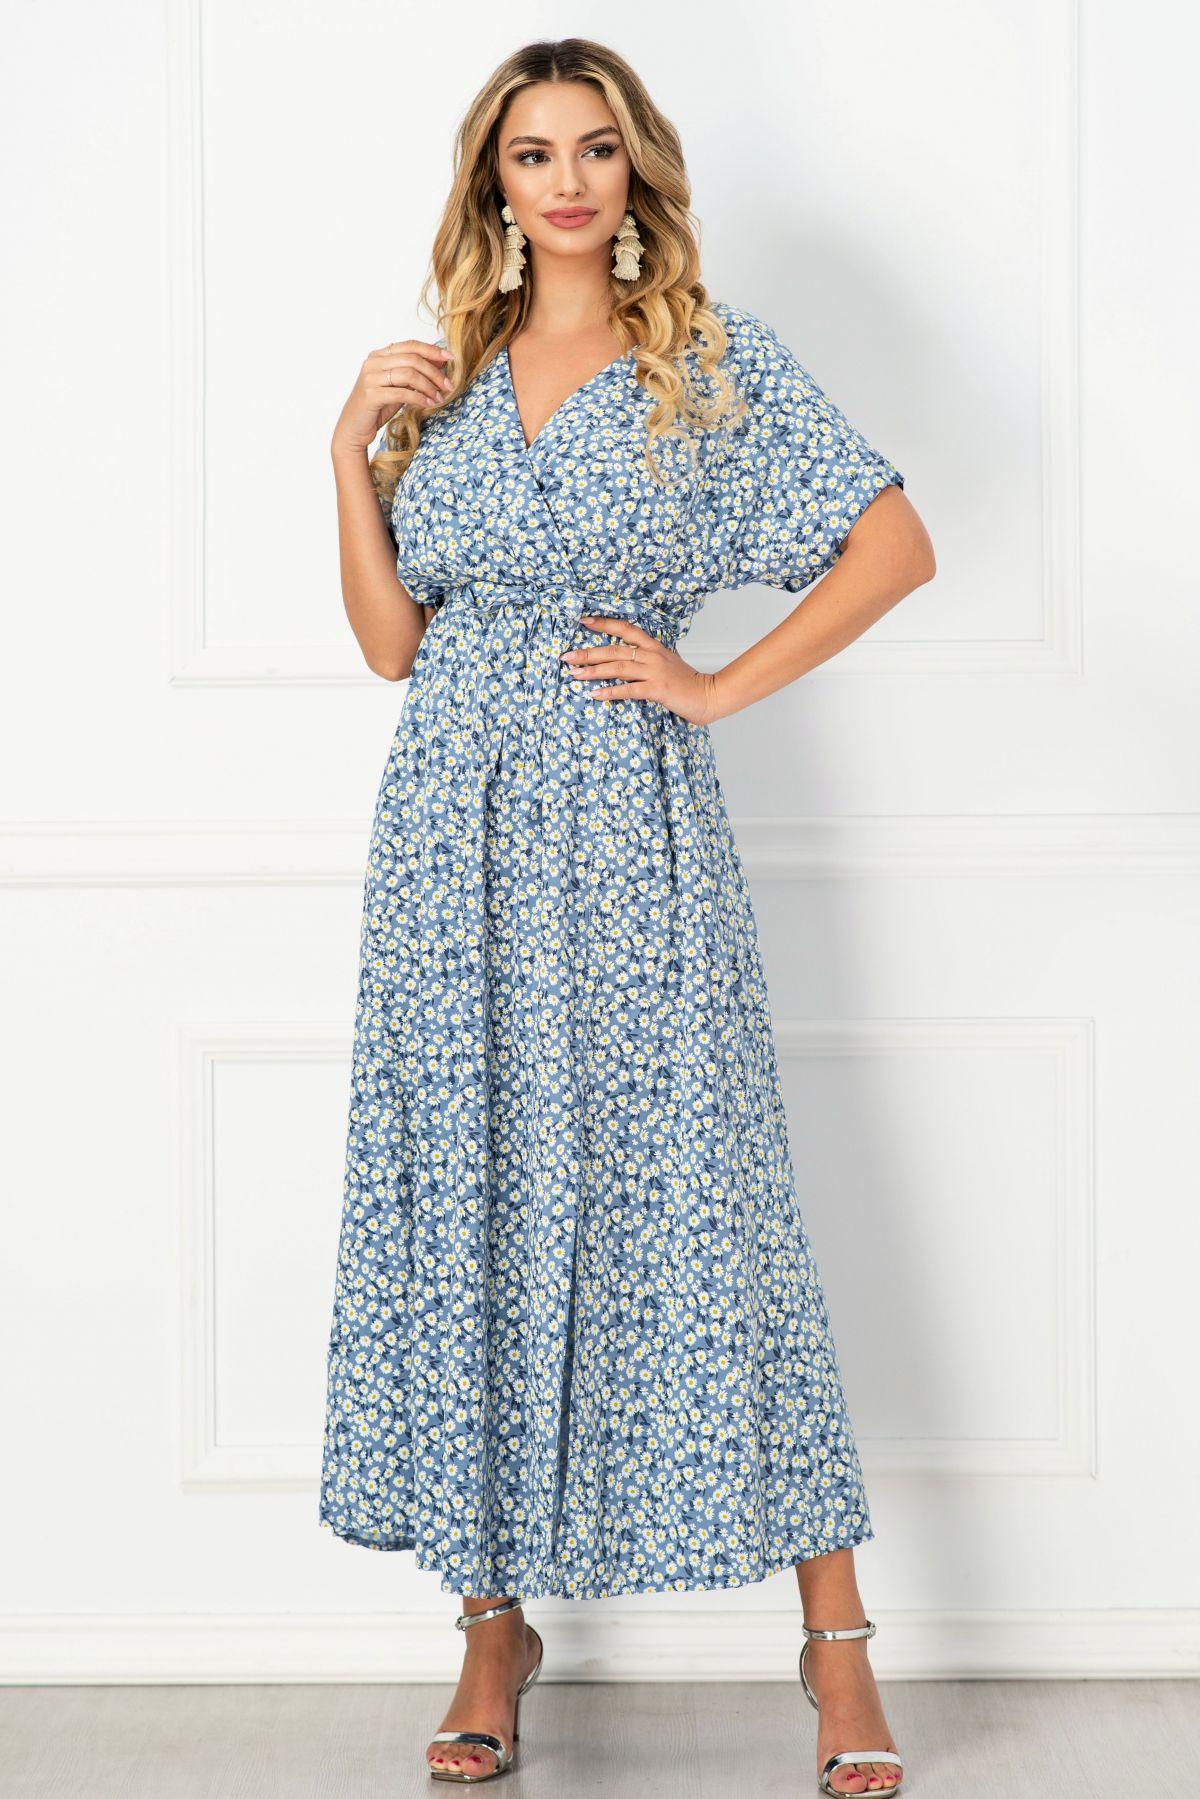 Rochie de vara lunga lejera bleu cu imprimeu margarete